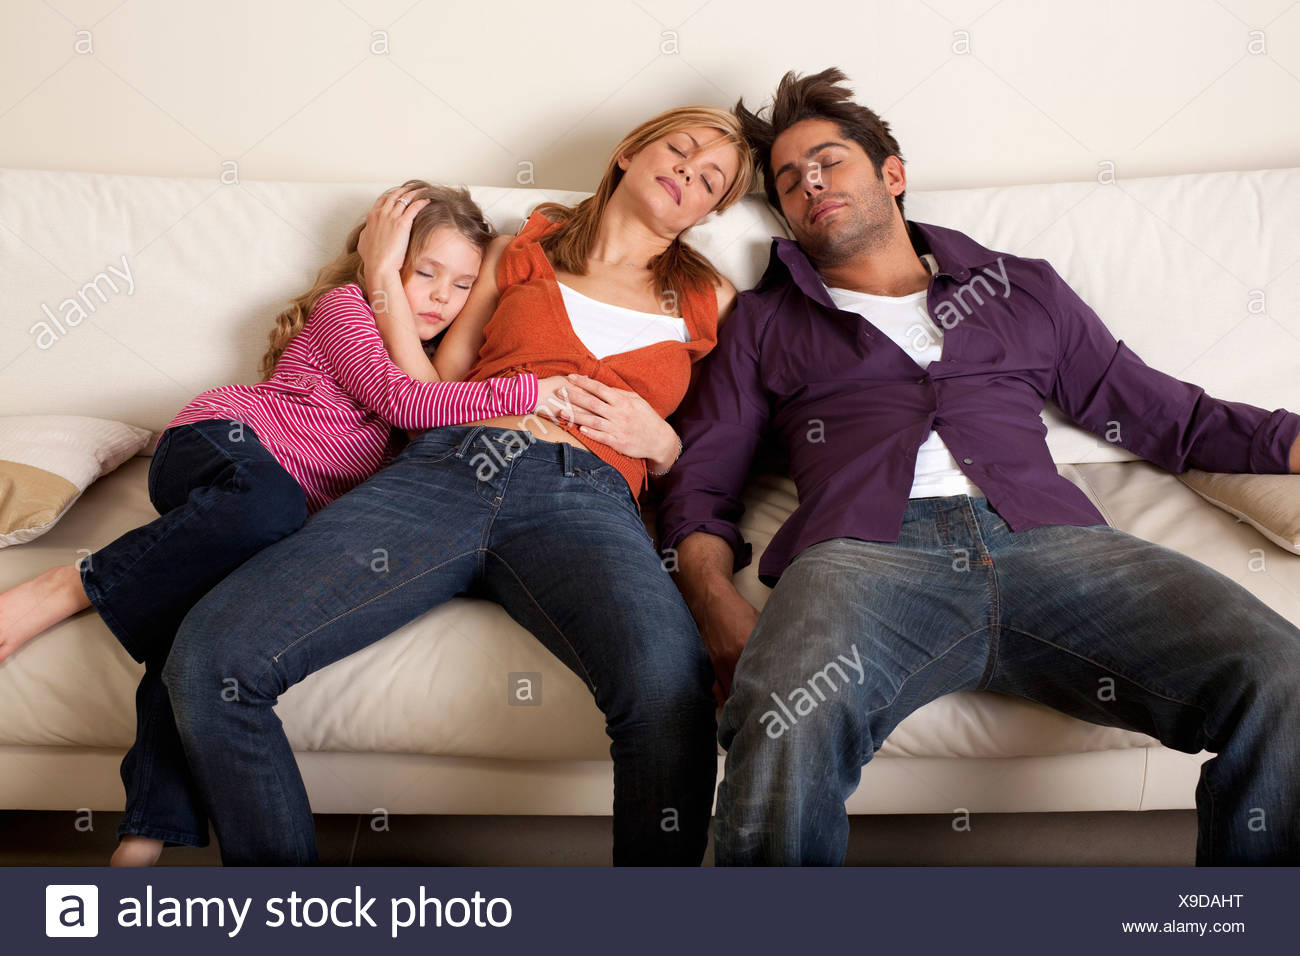 tired family asleep - Stock Image